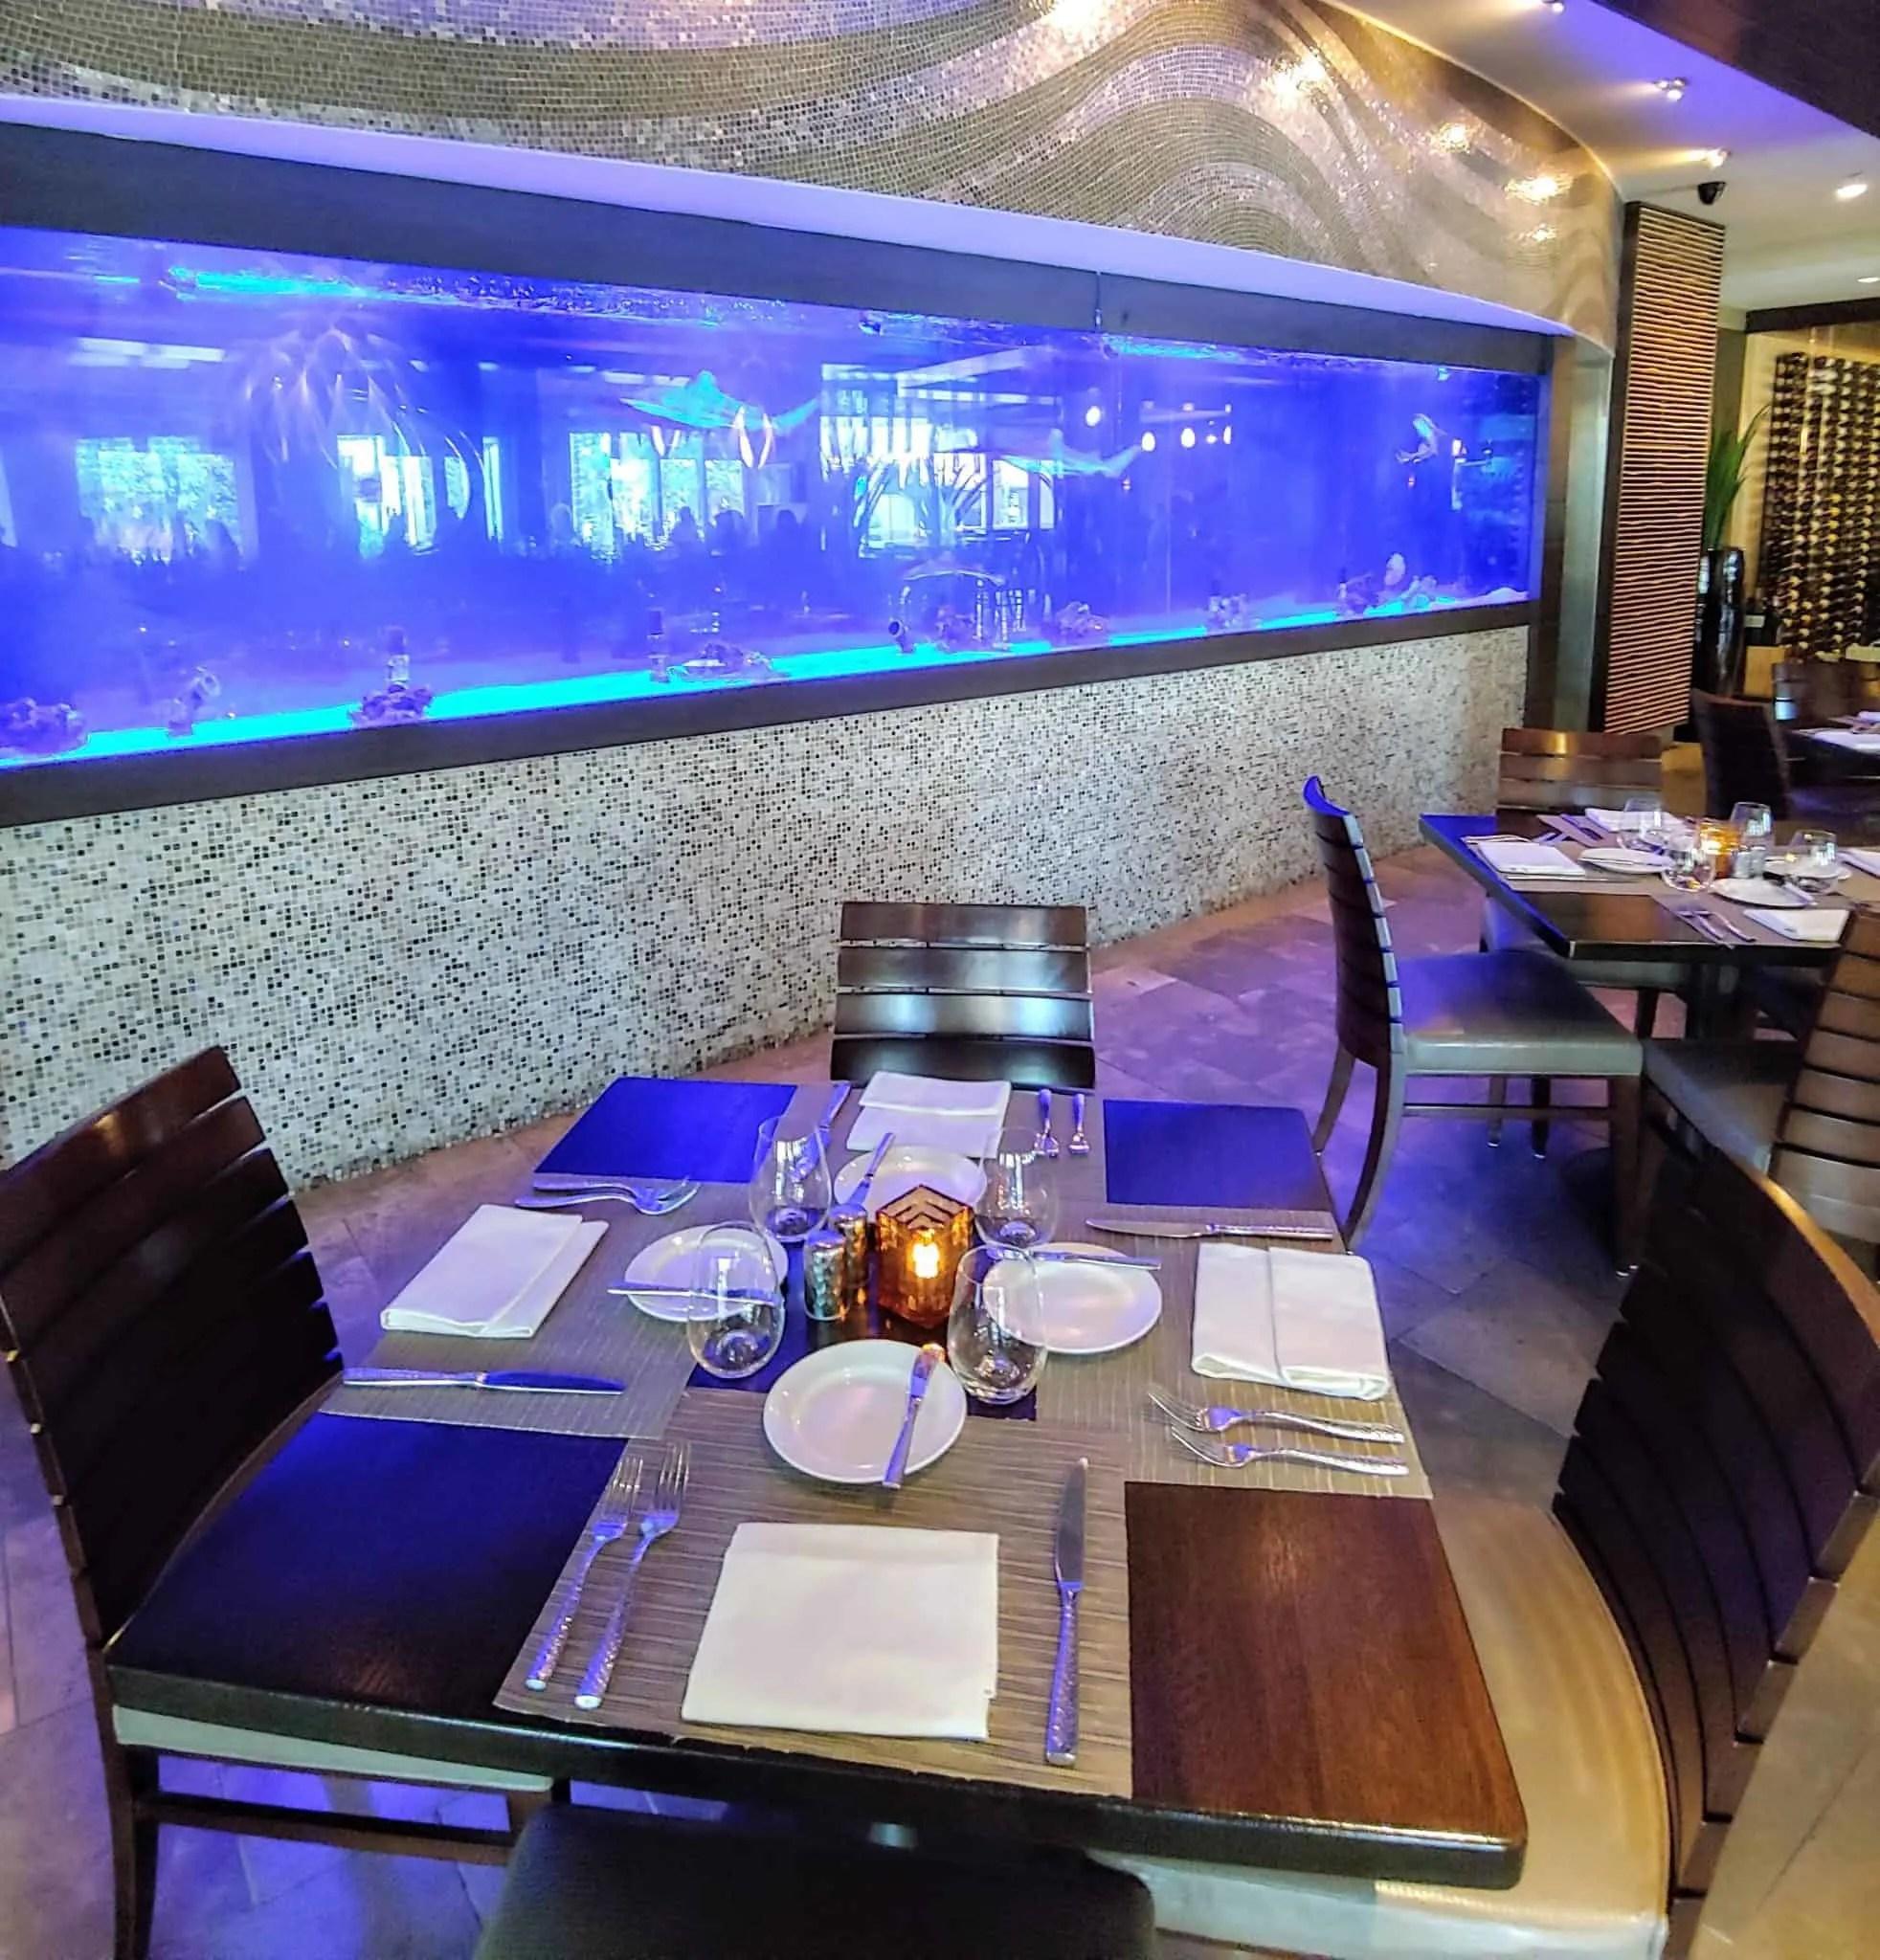 seagate hotel restaurant fish tank